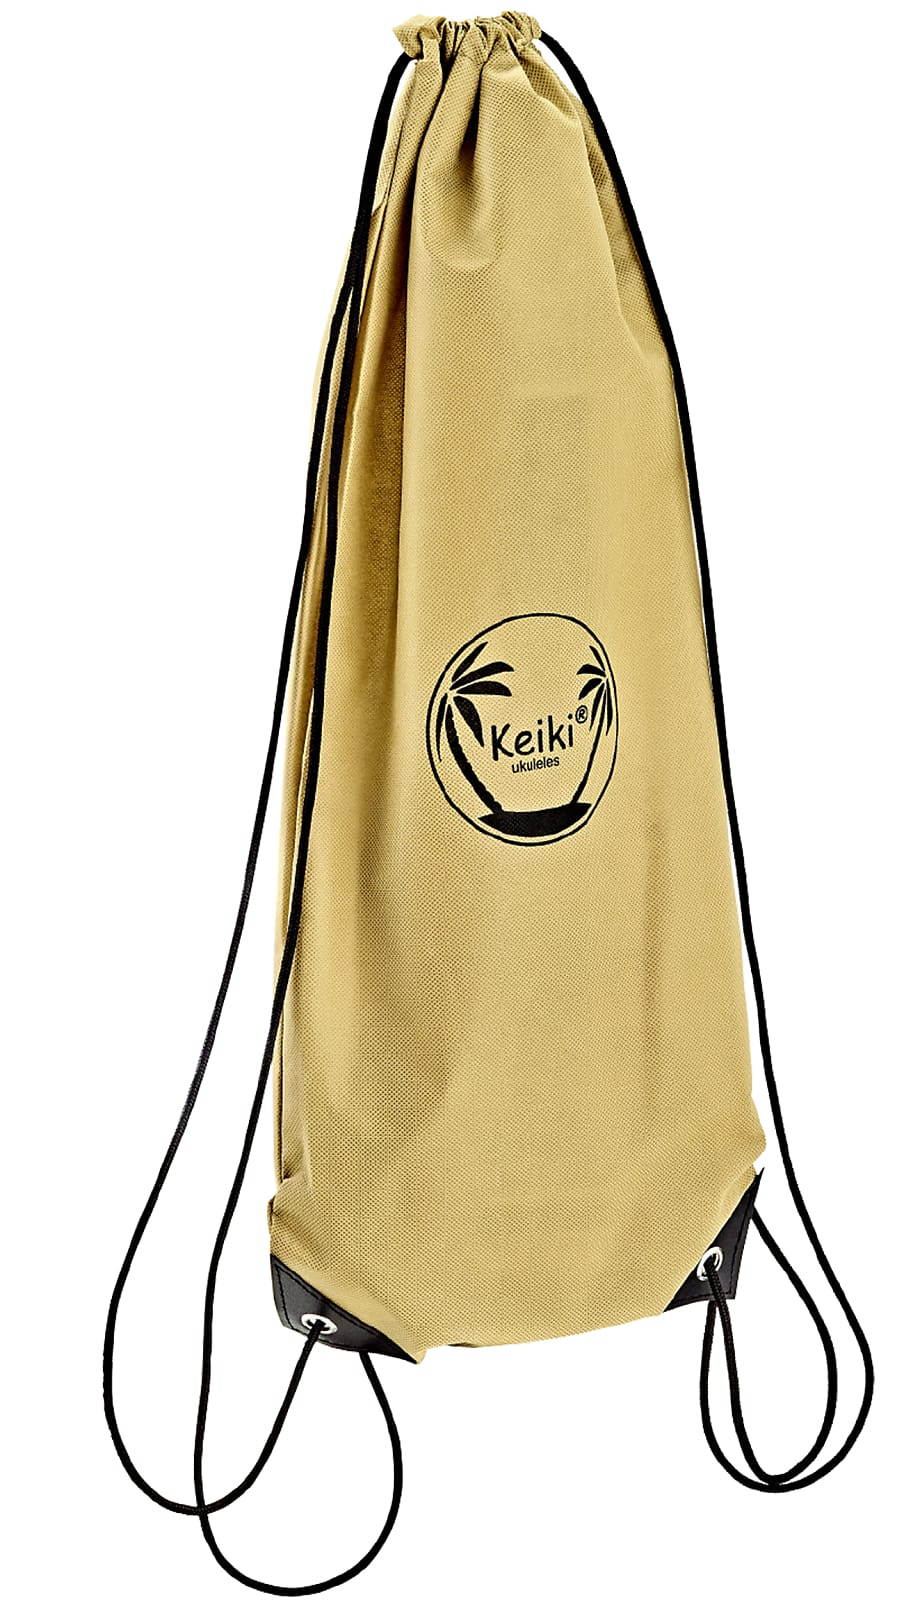 Ortega Keiki Designer Series Ukulele Soprano Spaceman K2-SP w/ Bag